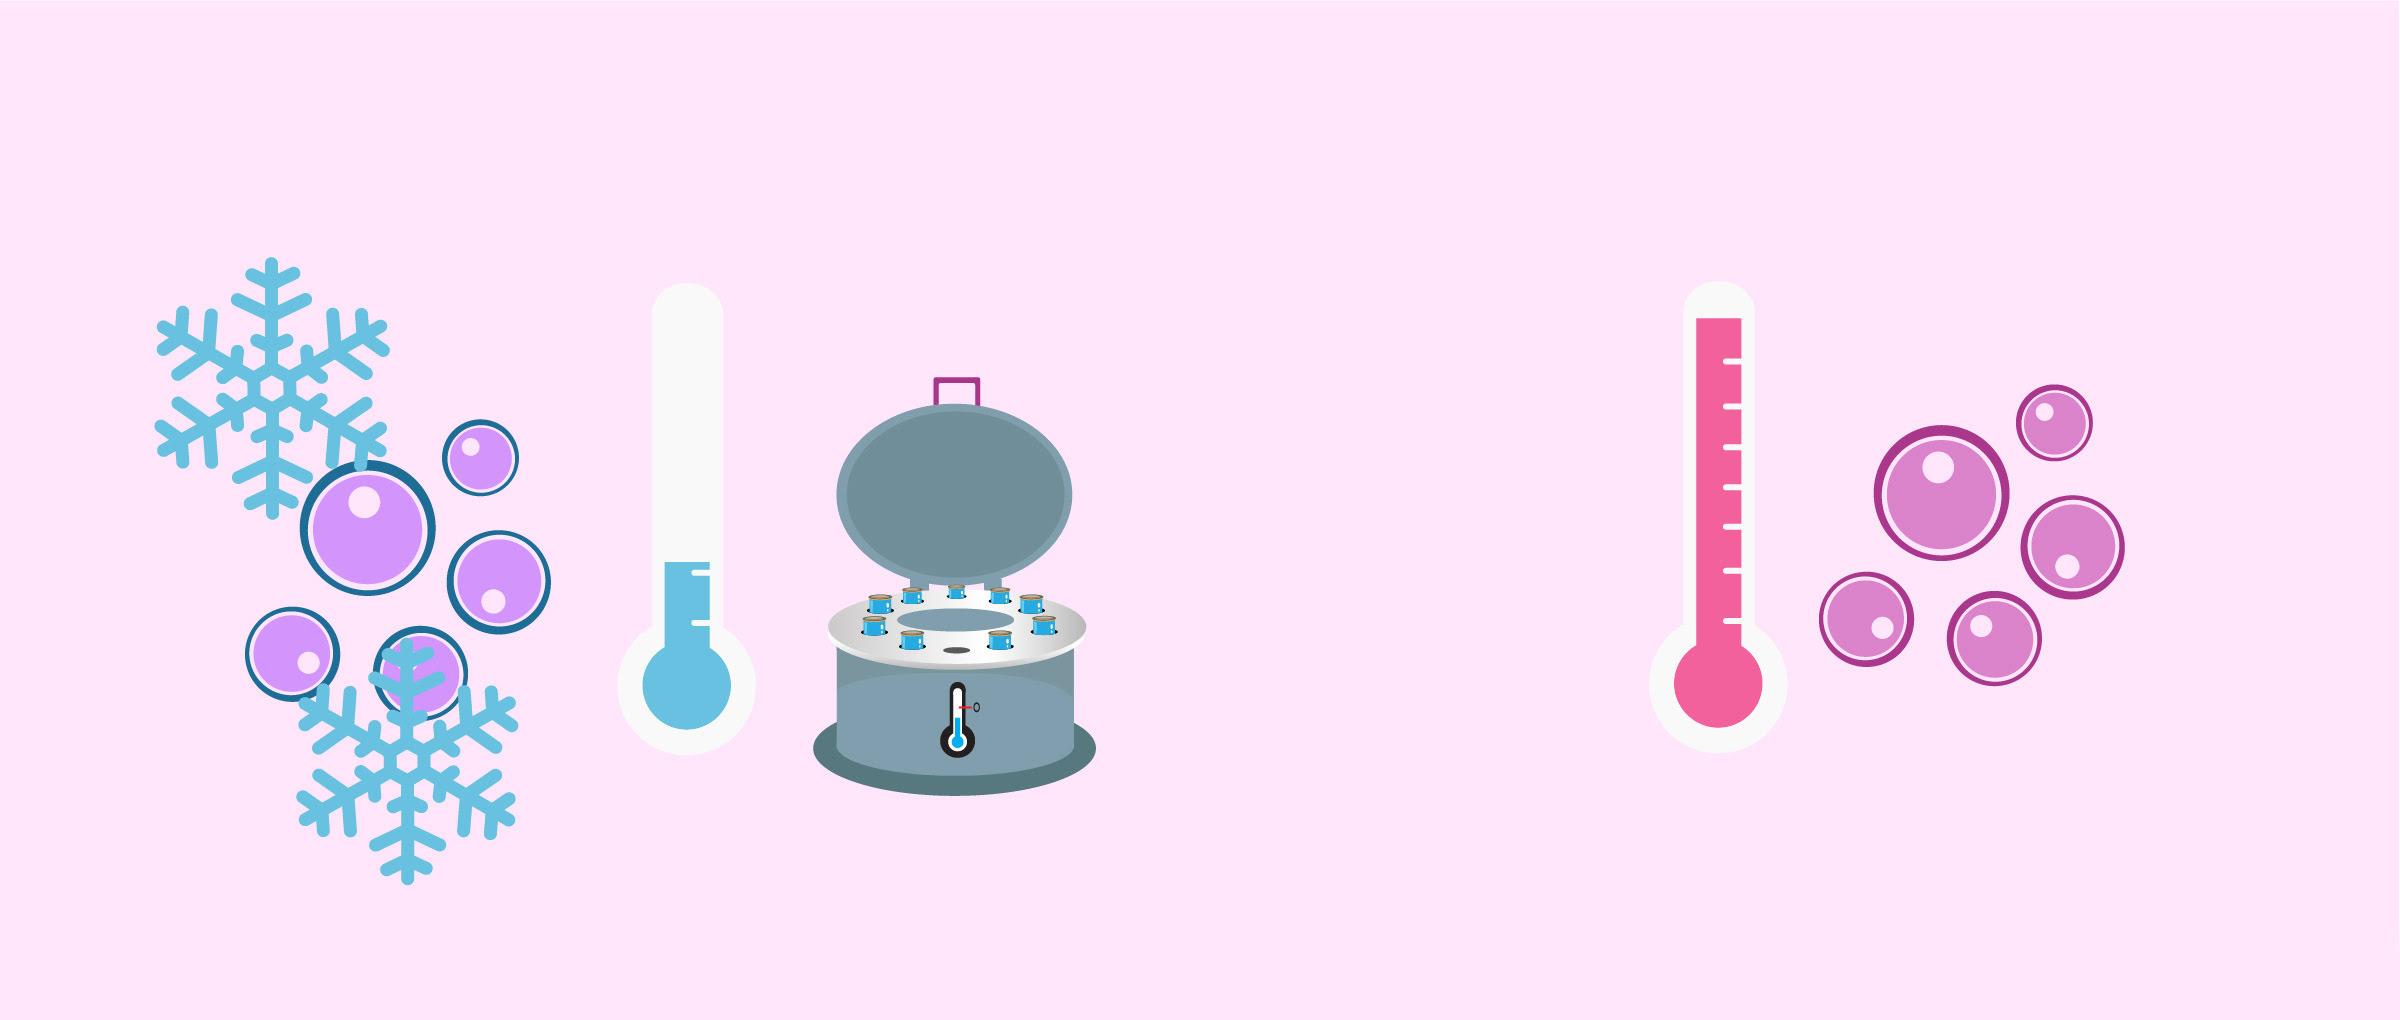 Don d'ovocytes avec ovules frais ou vitrifiés